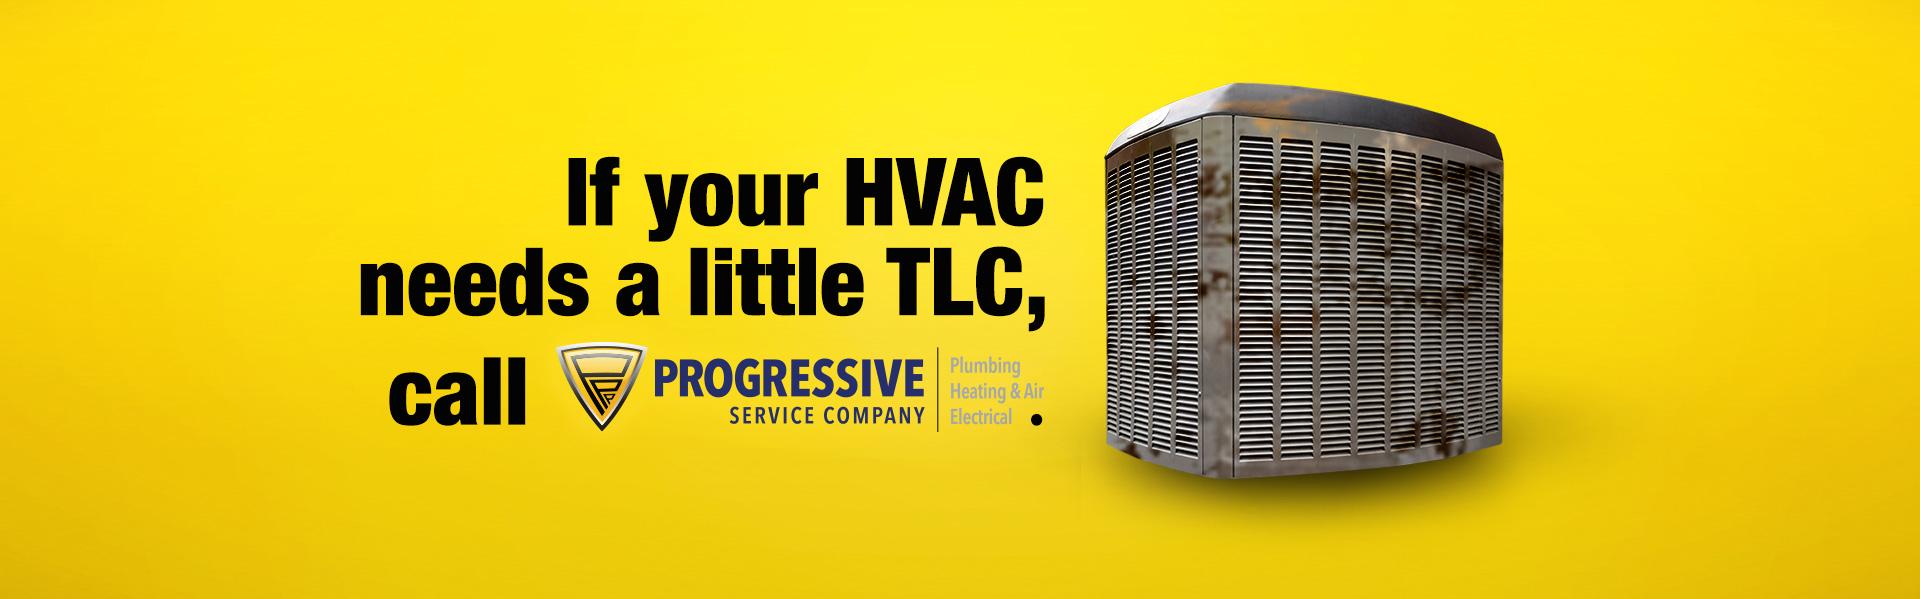 Plumbing Electrical Hvac Progressive Service Company